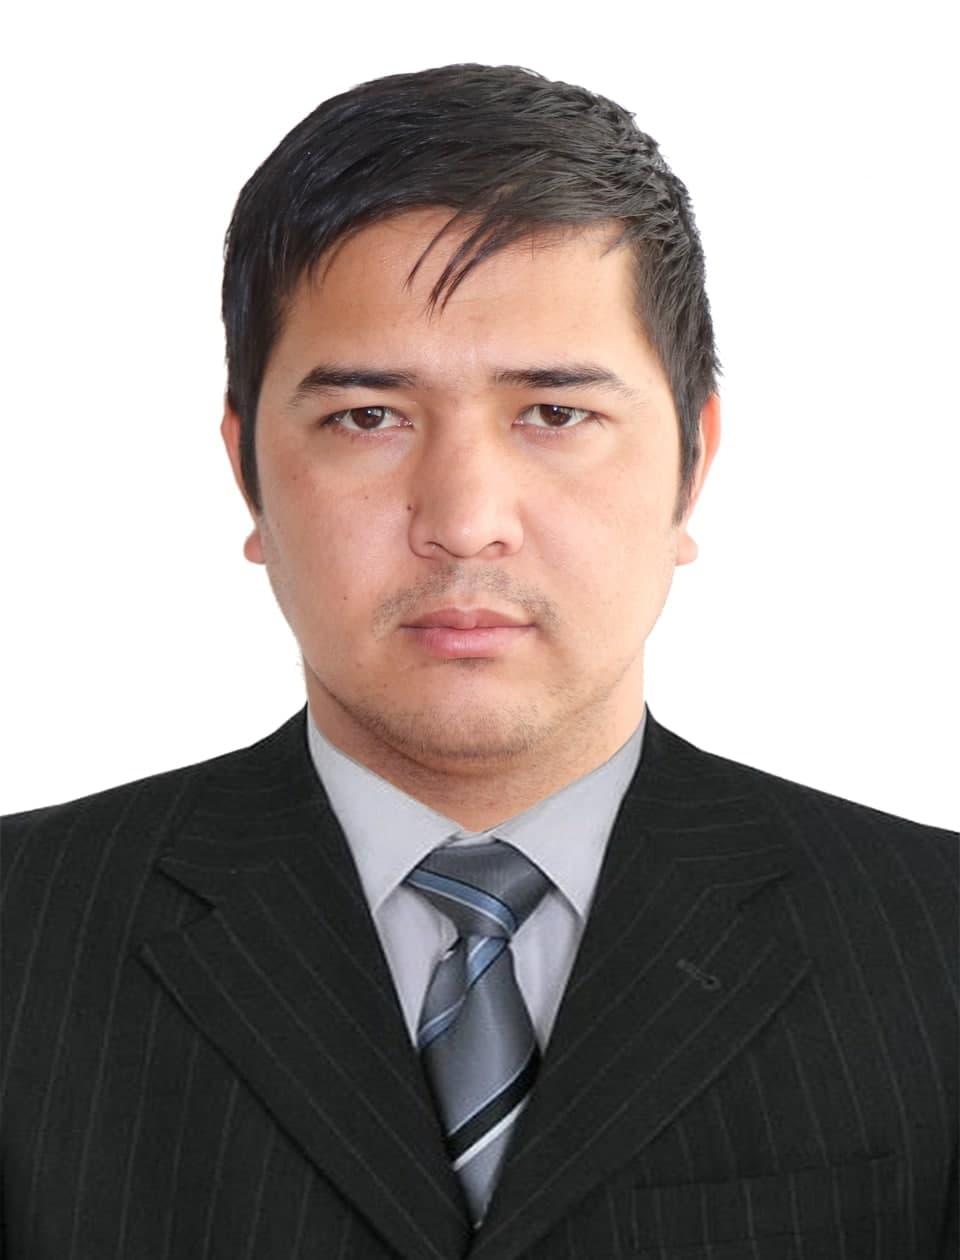 Хамраев Ғанишер  Райим ўғли